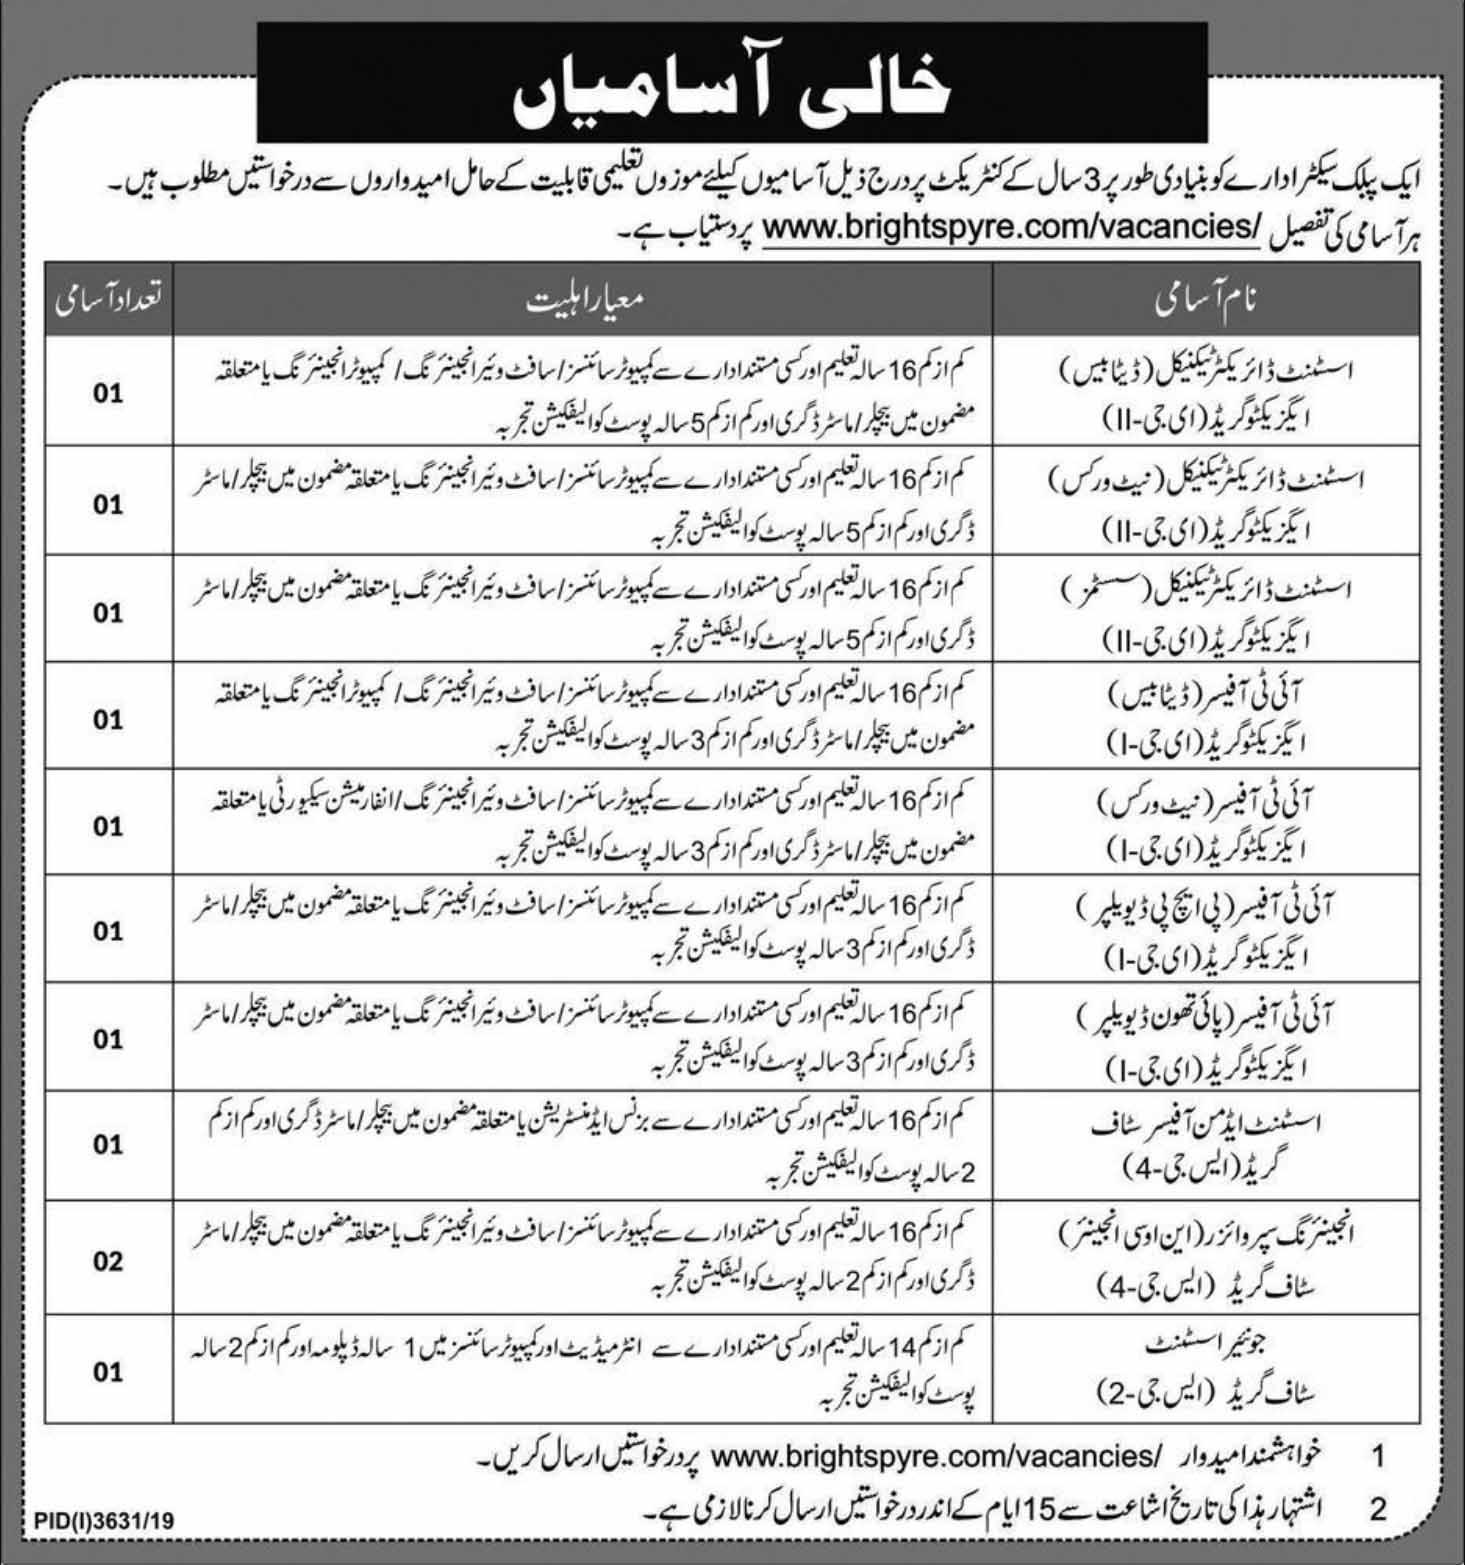 Public Sector Organization Jobs Jan 2020